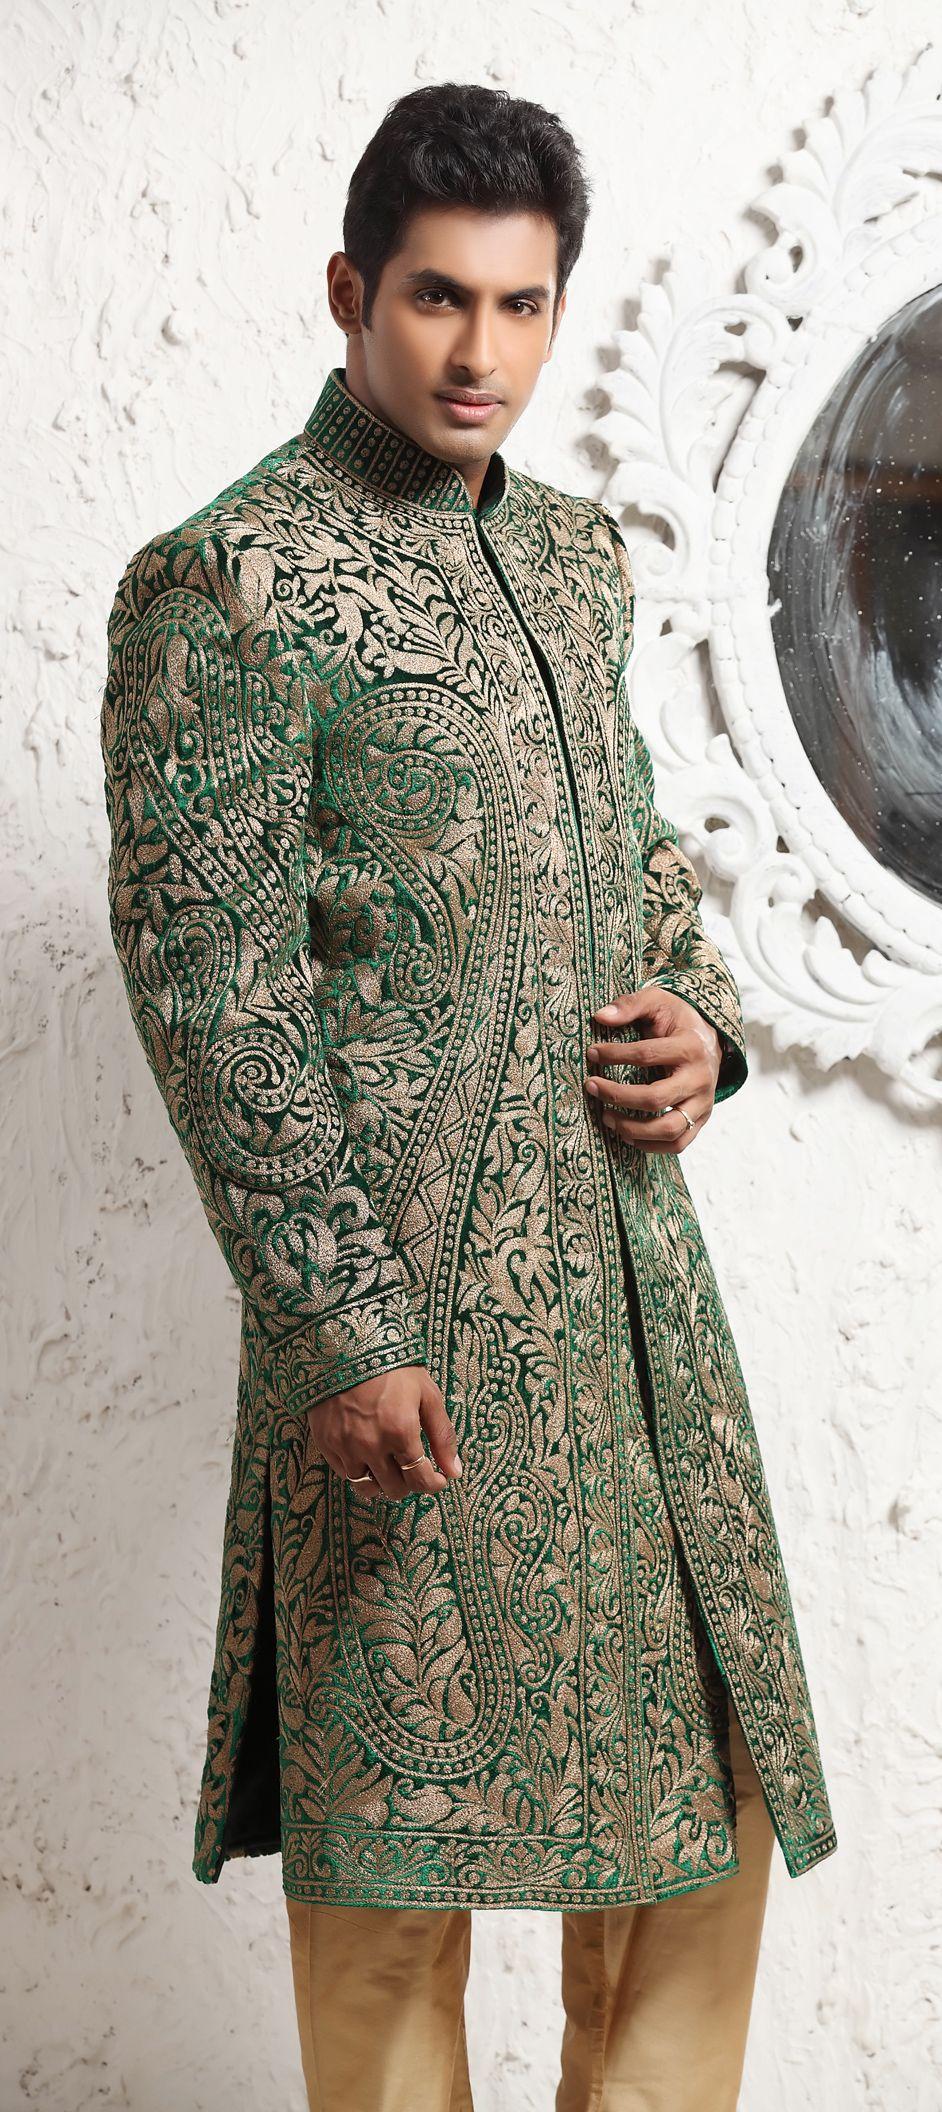 Brocade Sherwani in Green with Thread work